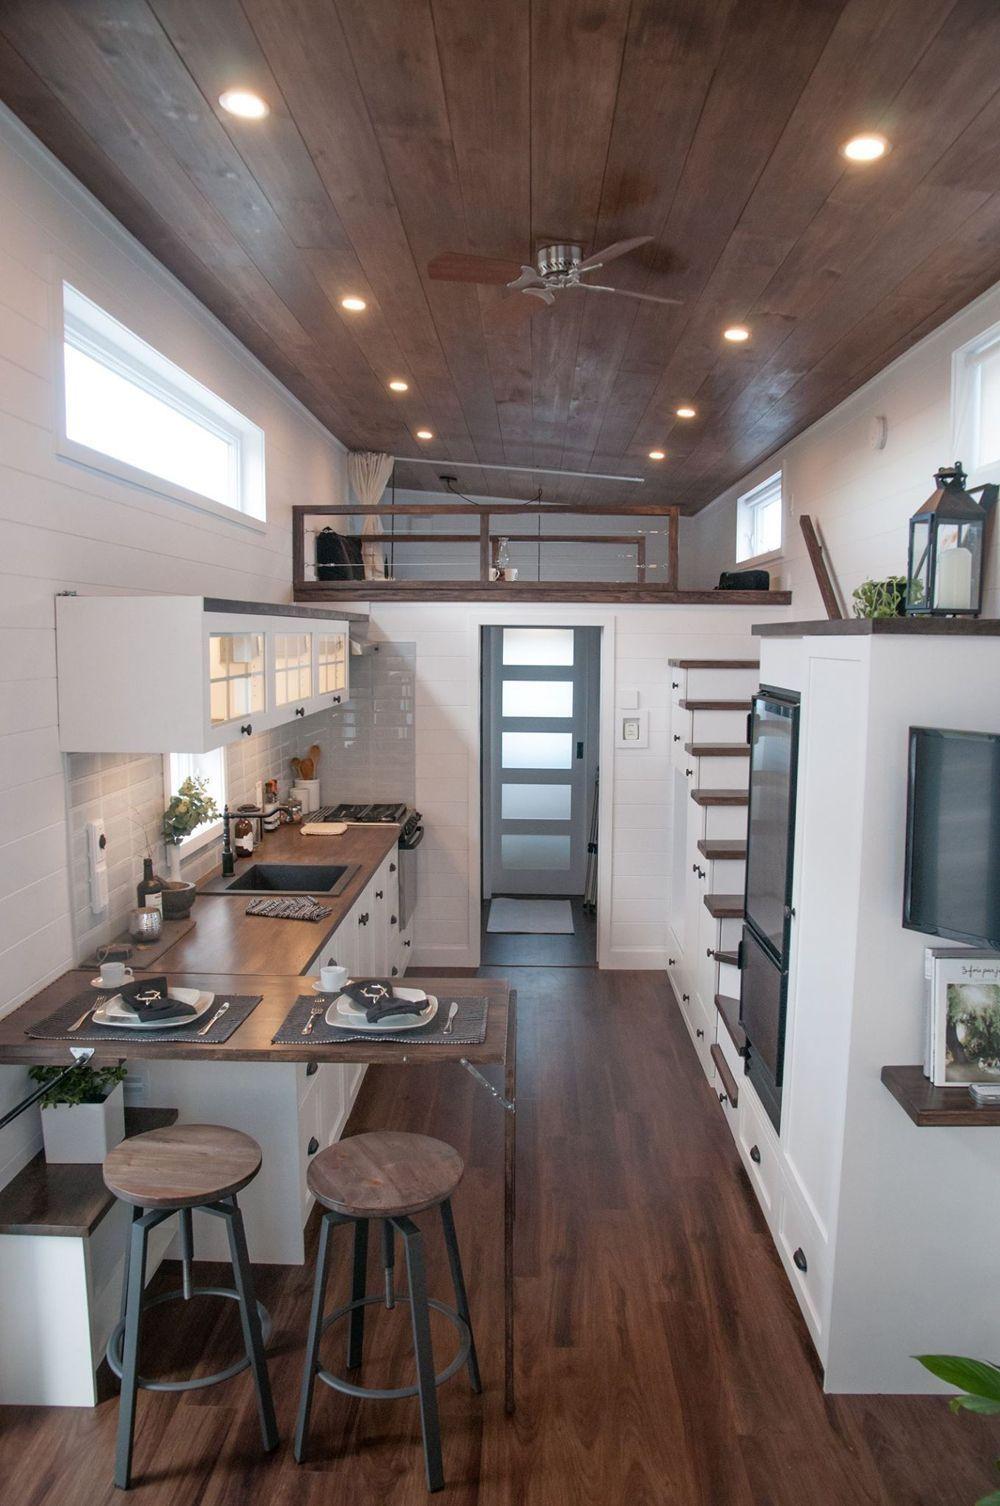 42 The Best And Unique Tiny House Design Ideas Kleines Haus